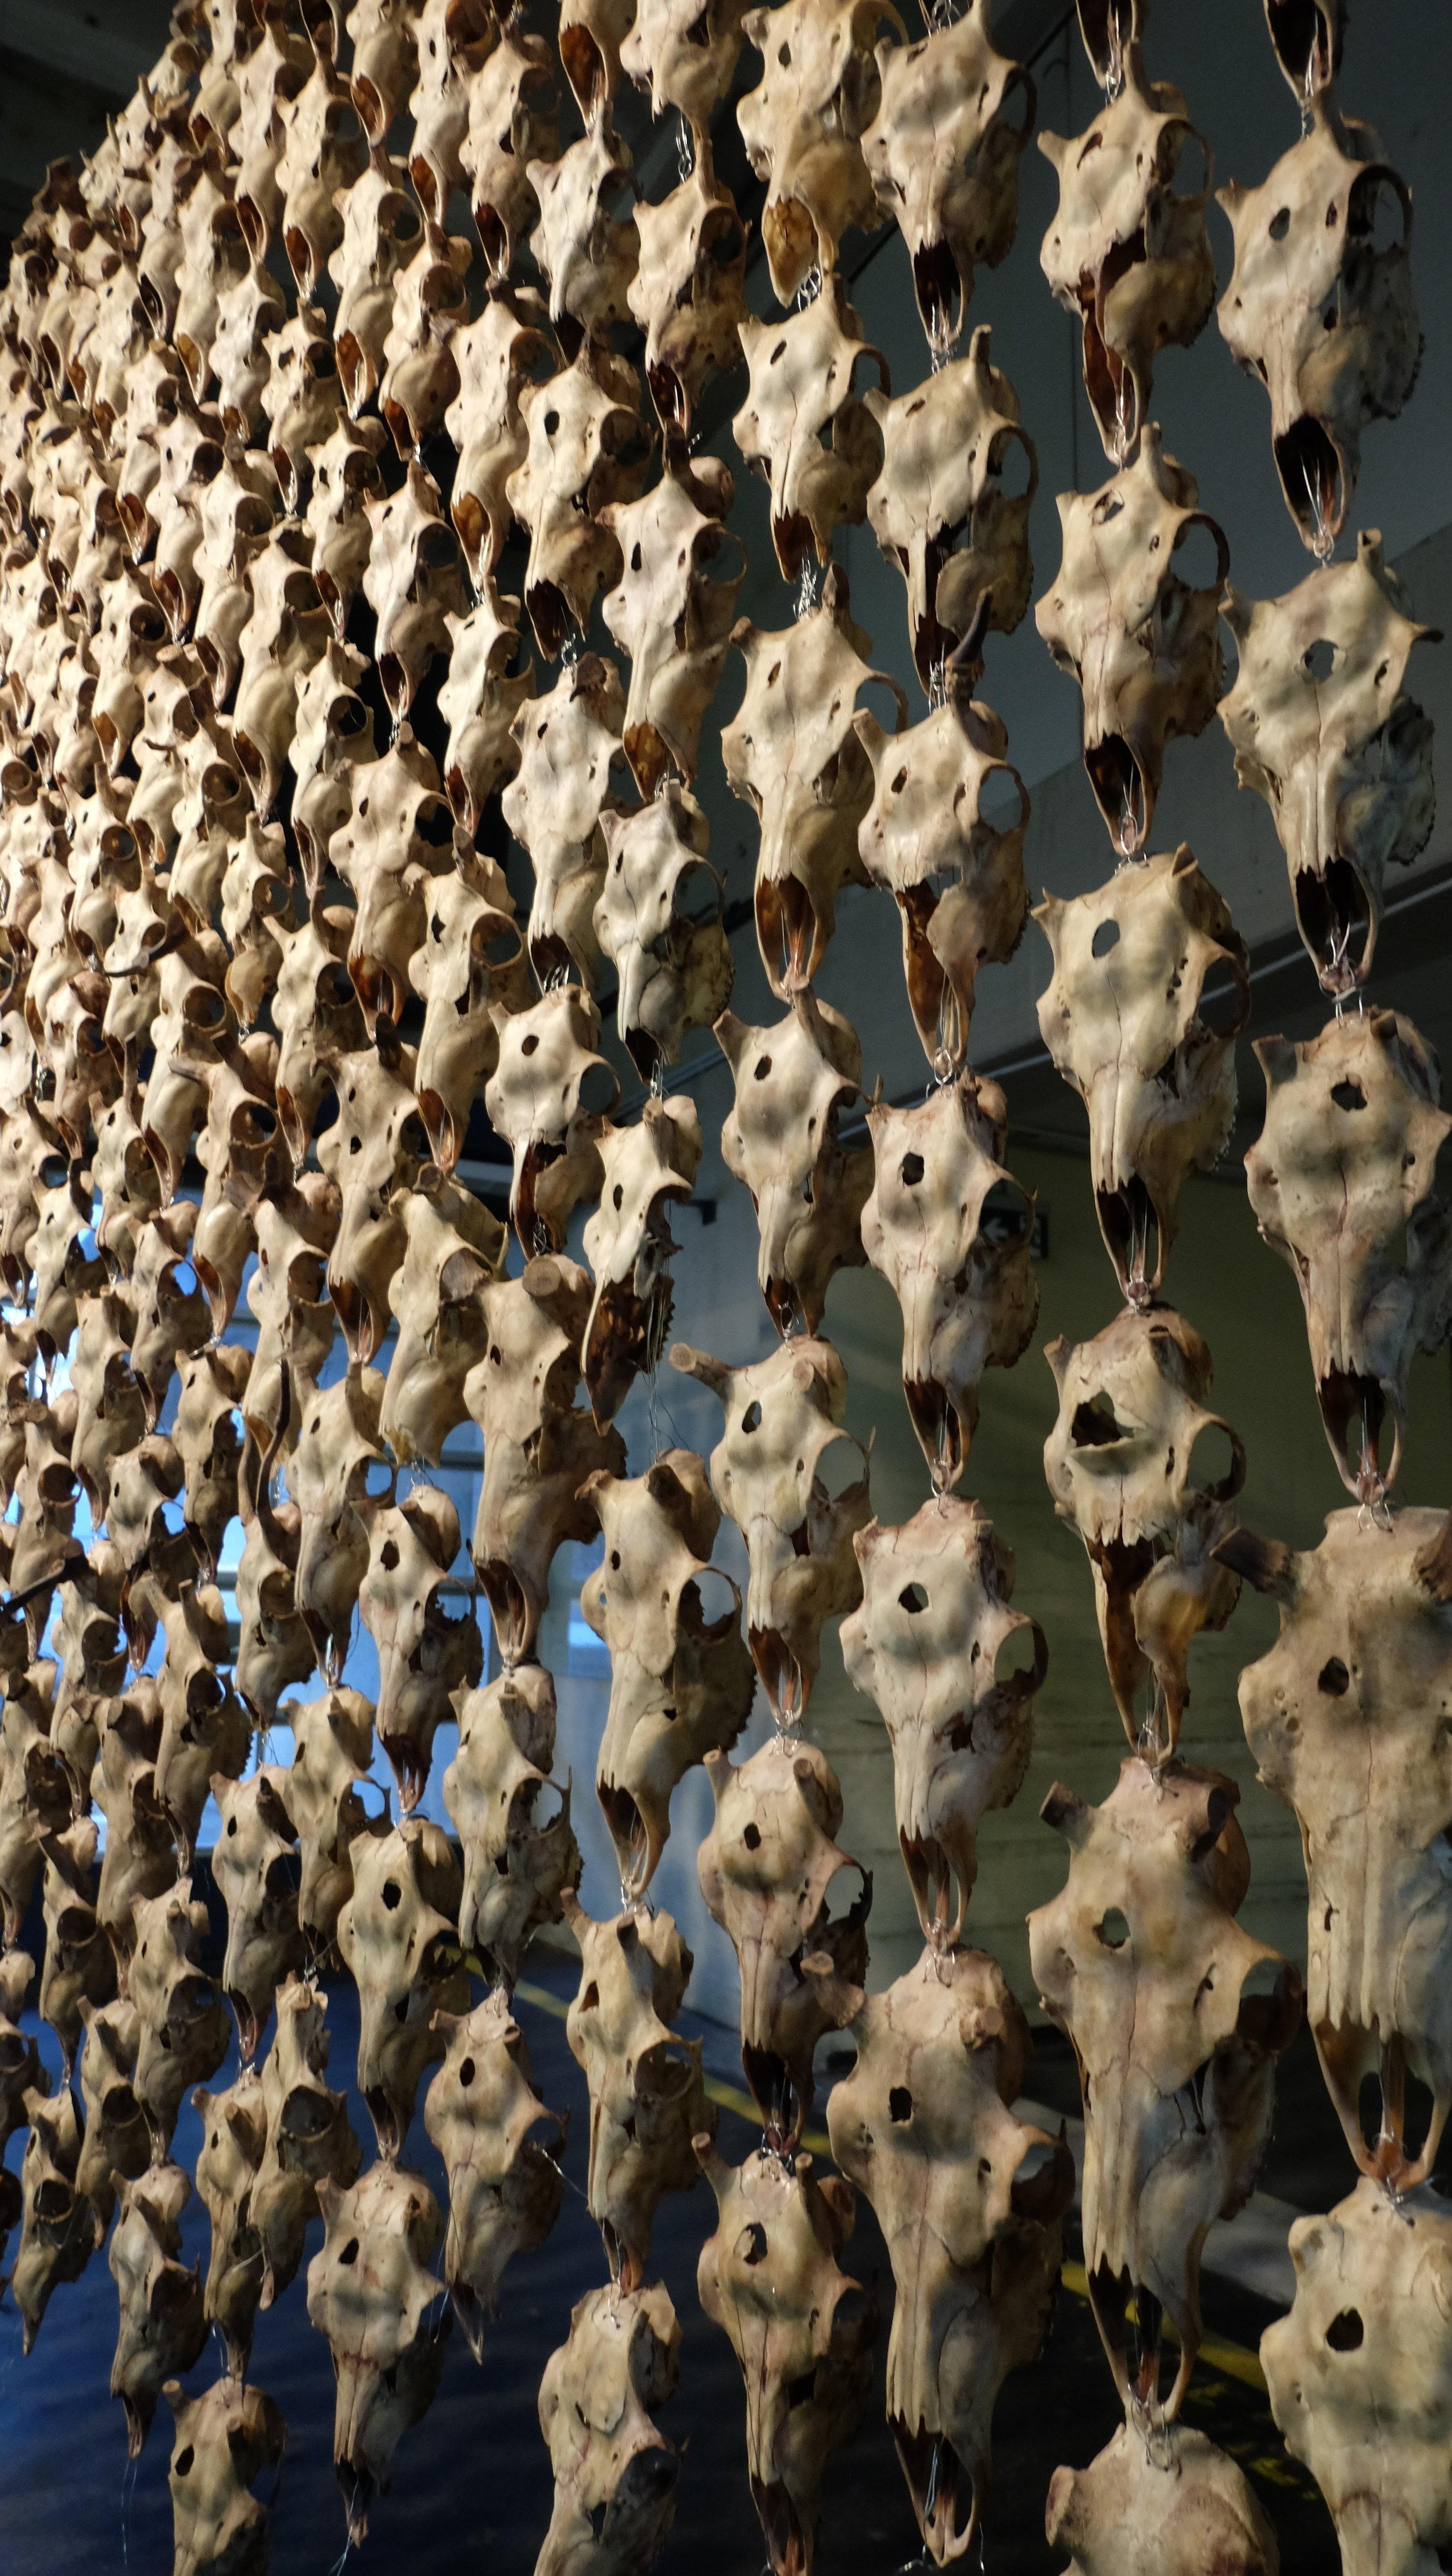 MÁRET ÁNNE SARA,Pile o' Sápmi,2017.  Curtain made from reindeer skulls and metal wire  Neue Neue Galerie (Neue Hauptpost), Kassel.